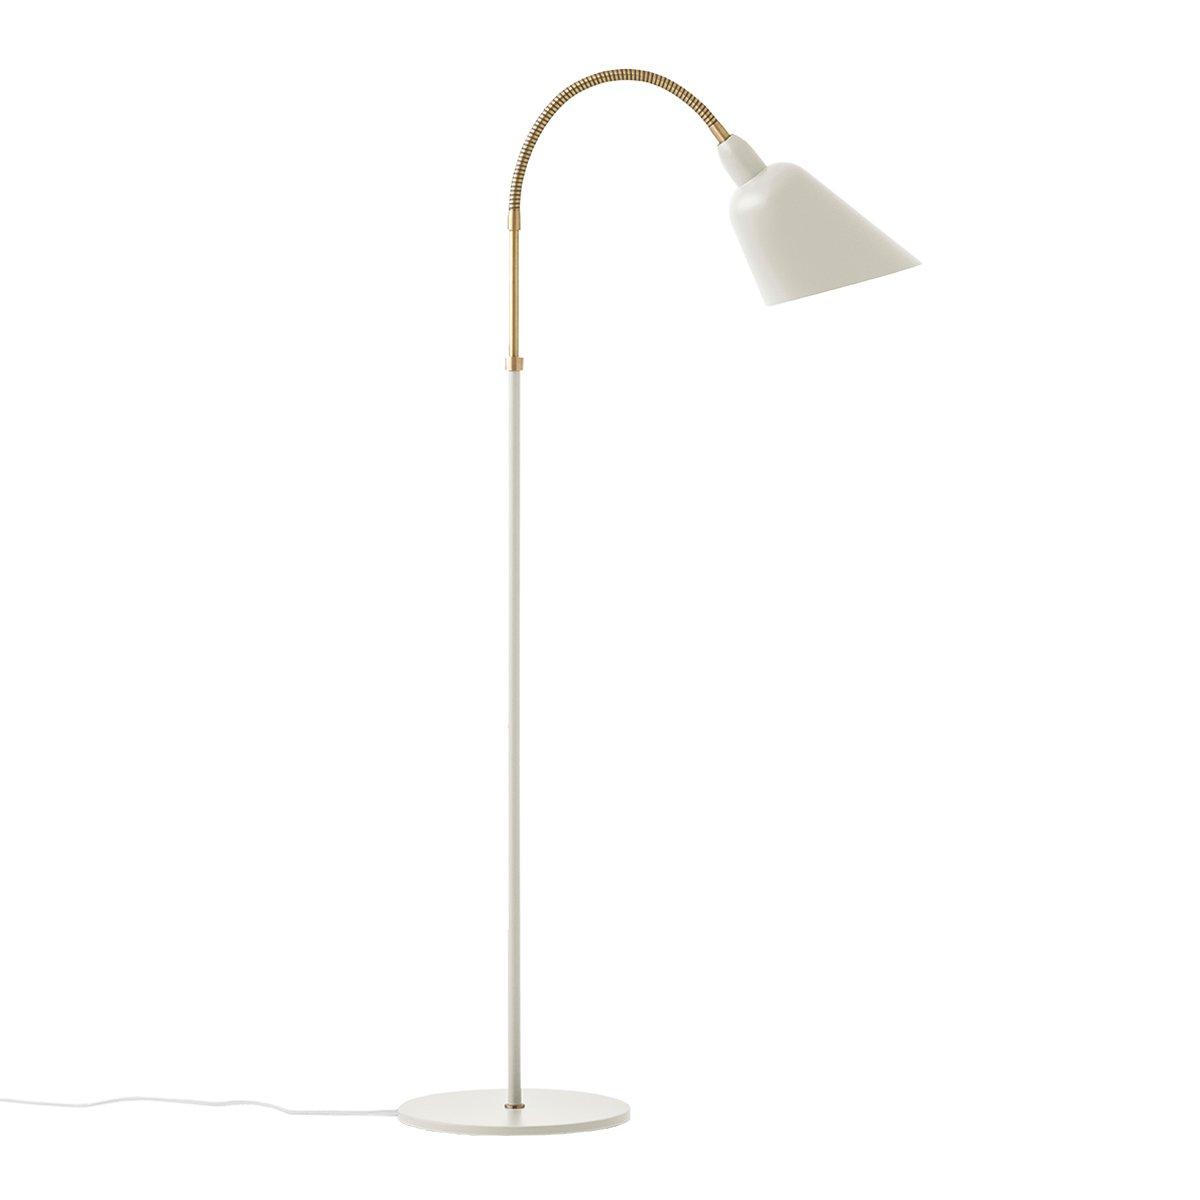 &Tradition Bellevue AJ7 Vloerlamp - Wit / Messing